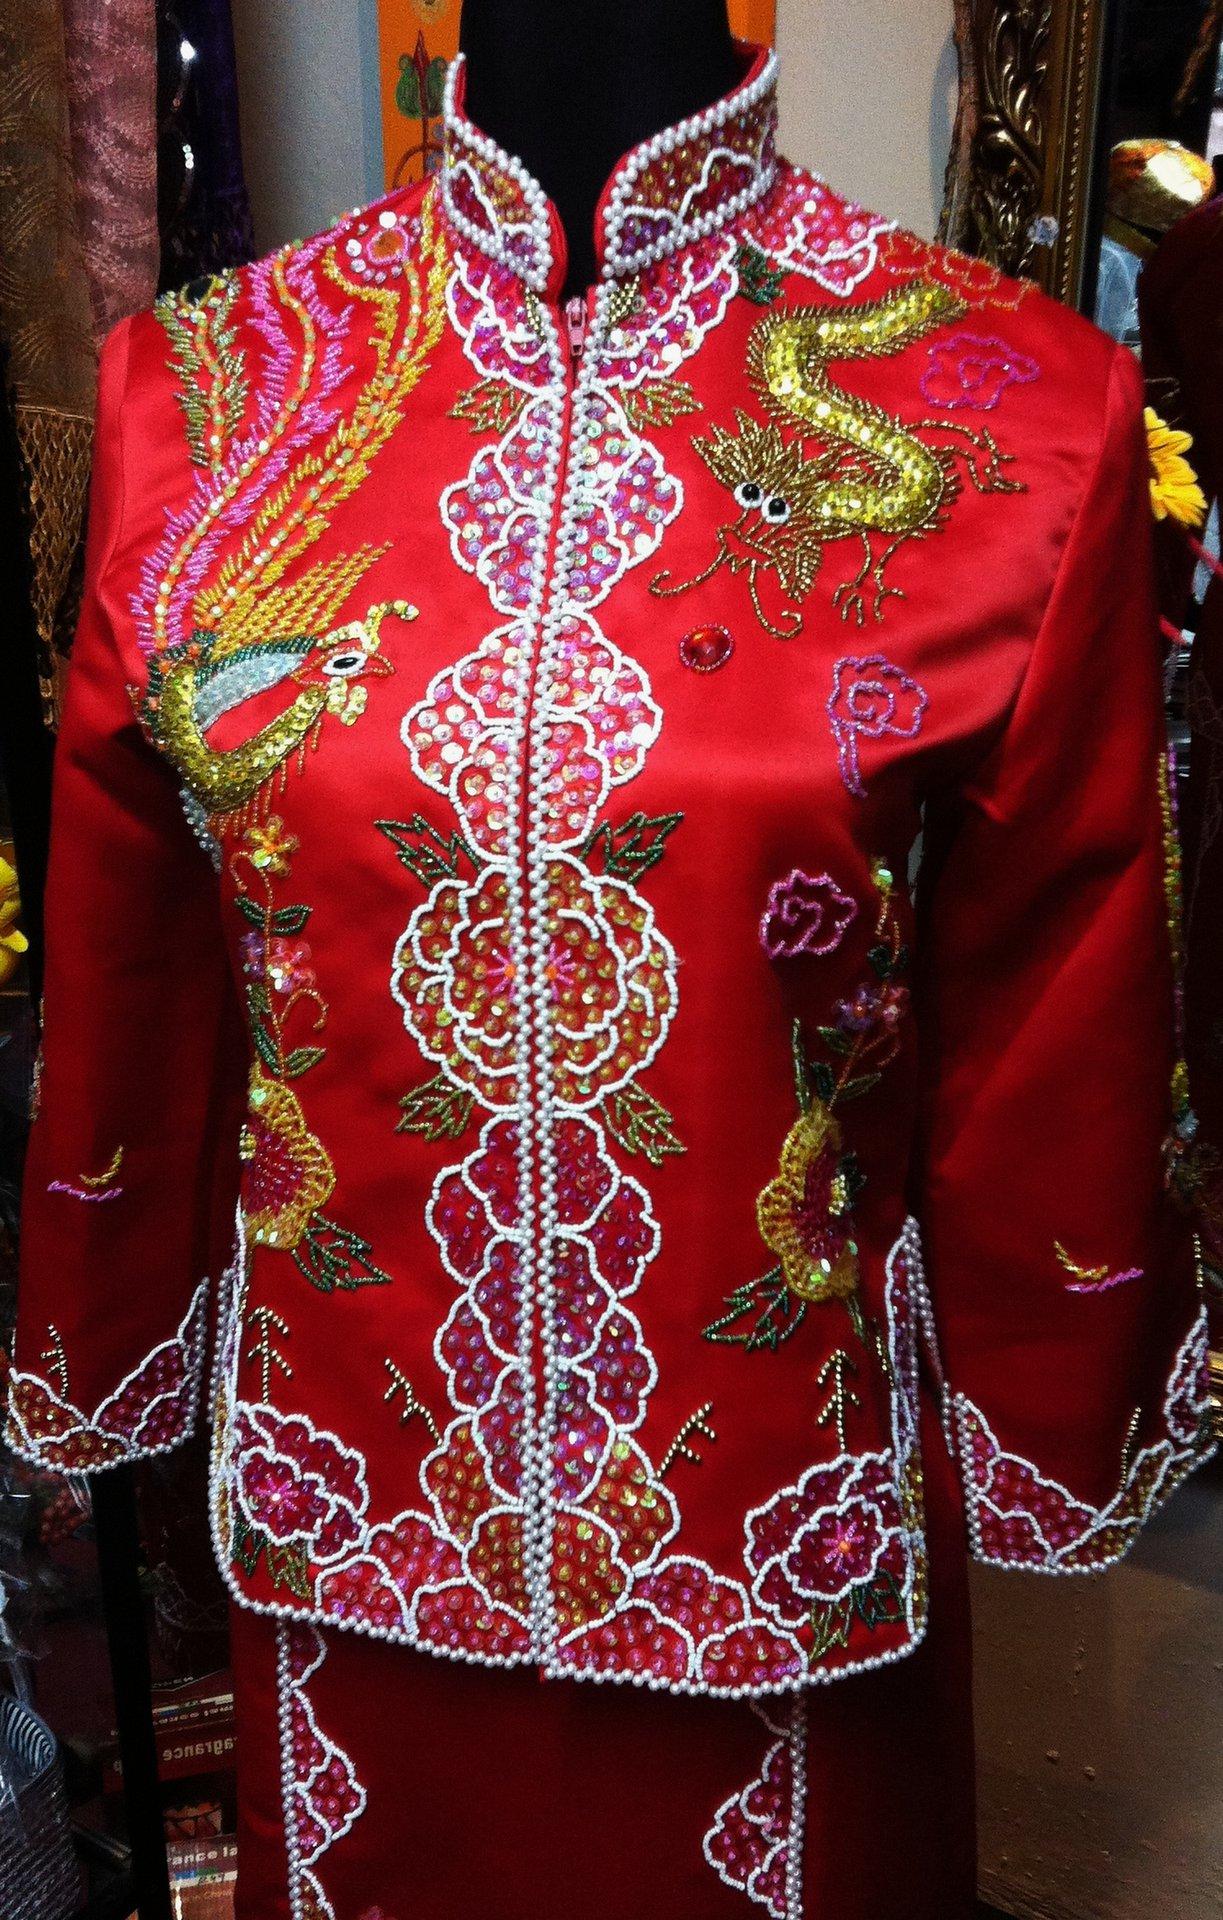 The Peranakan I